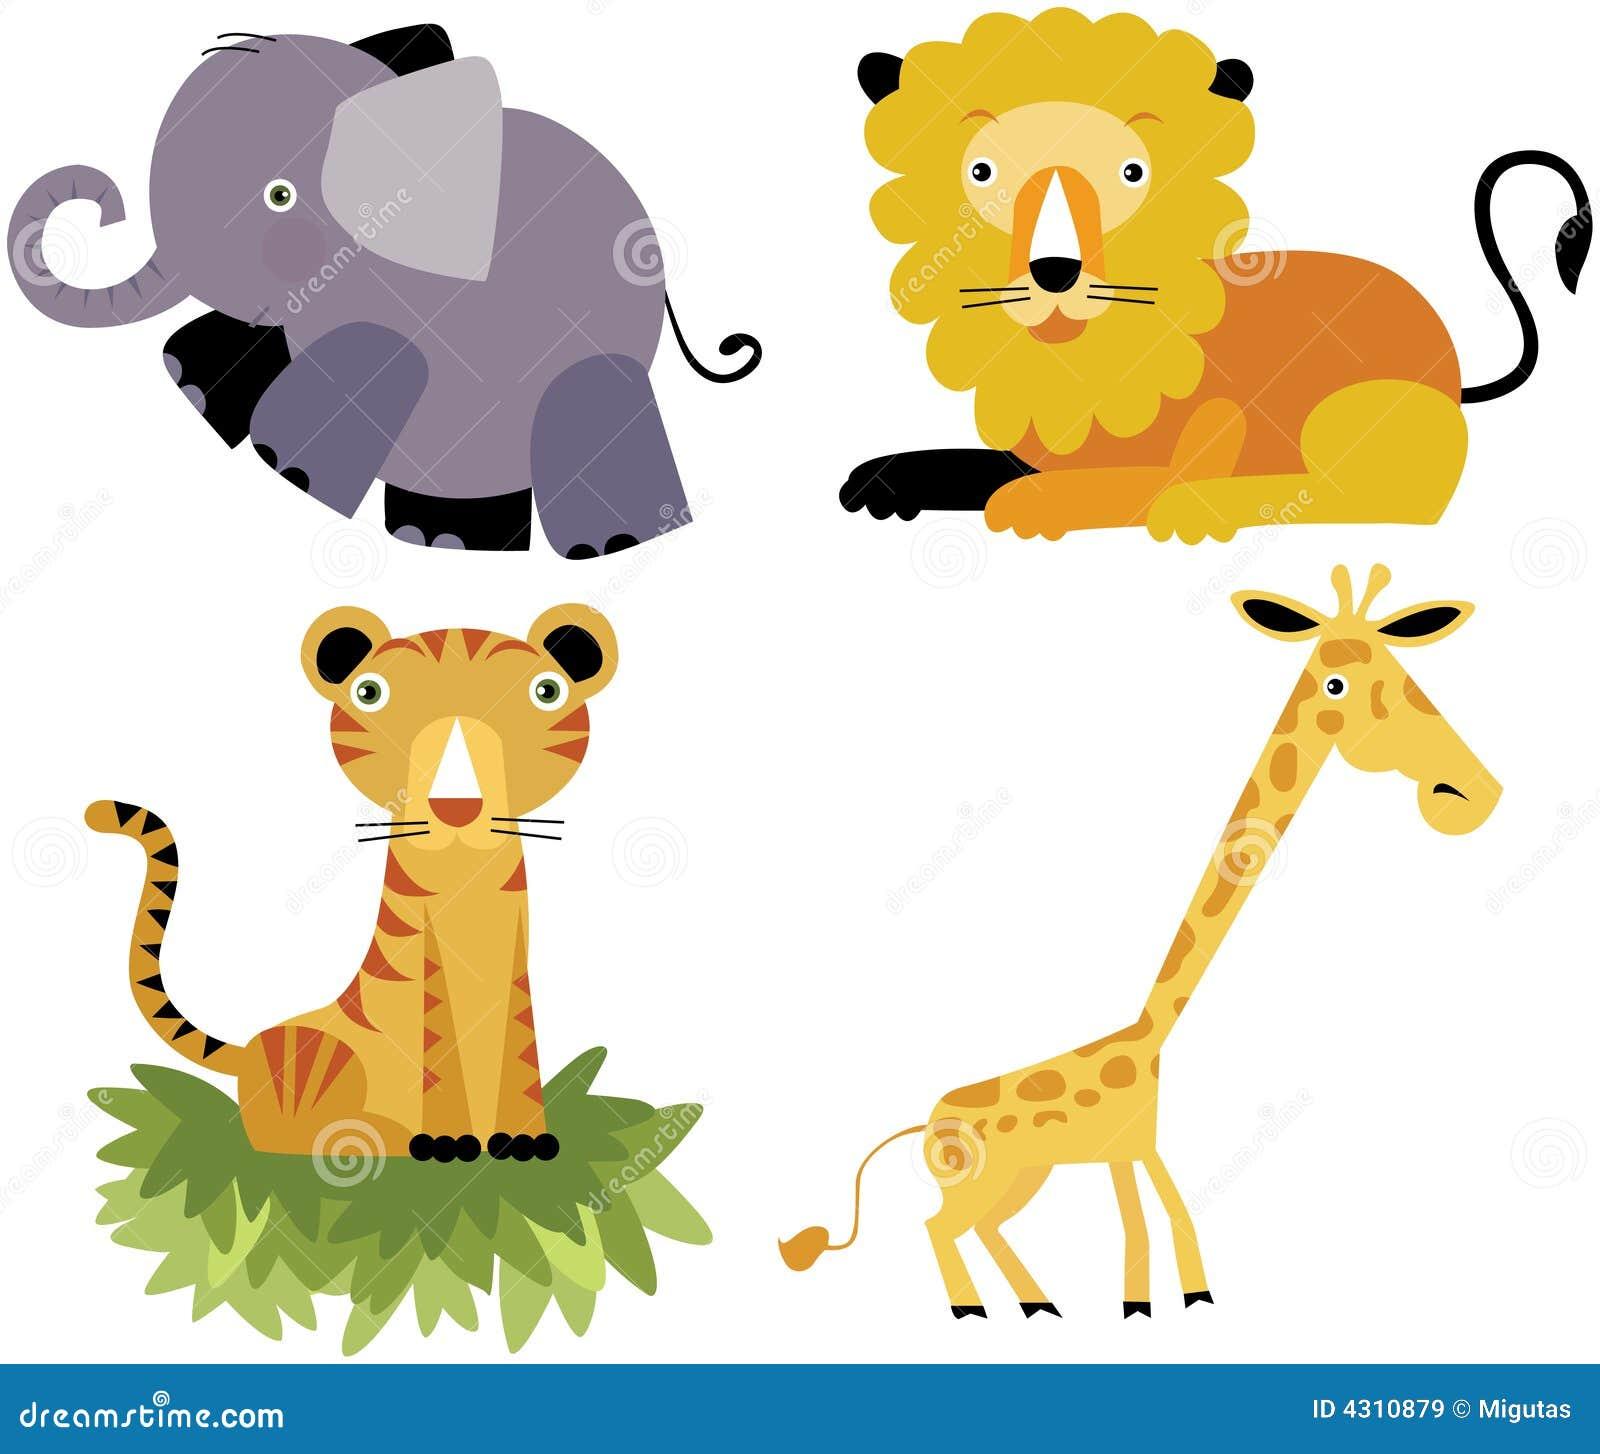 safari cartoon animal vector set royalty free stock images image